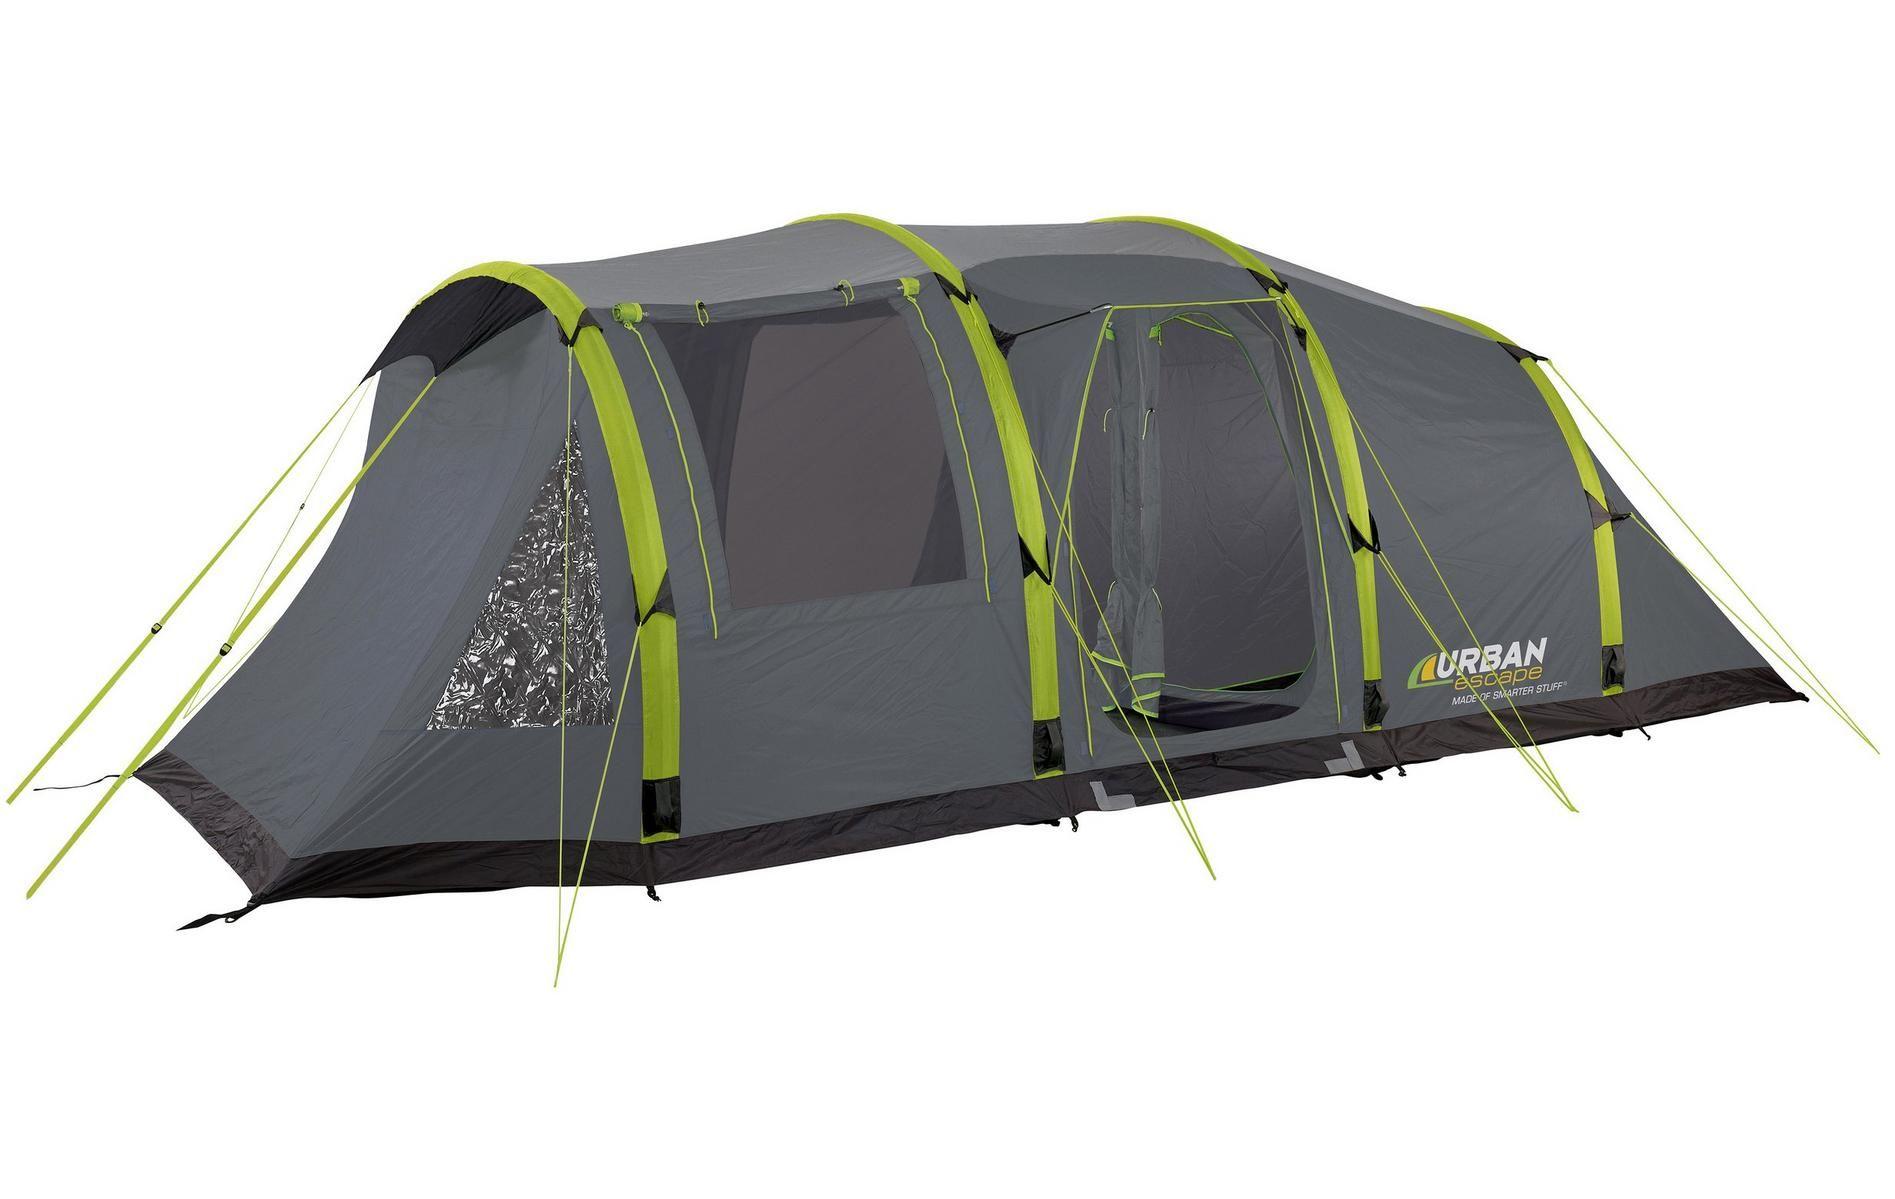 Urban Escape 6 Person Inflatable Tent Air Tent Tent Tent Sale